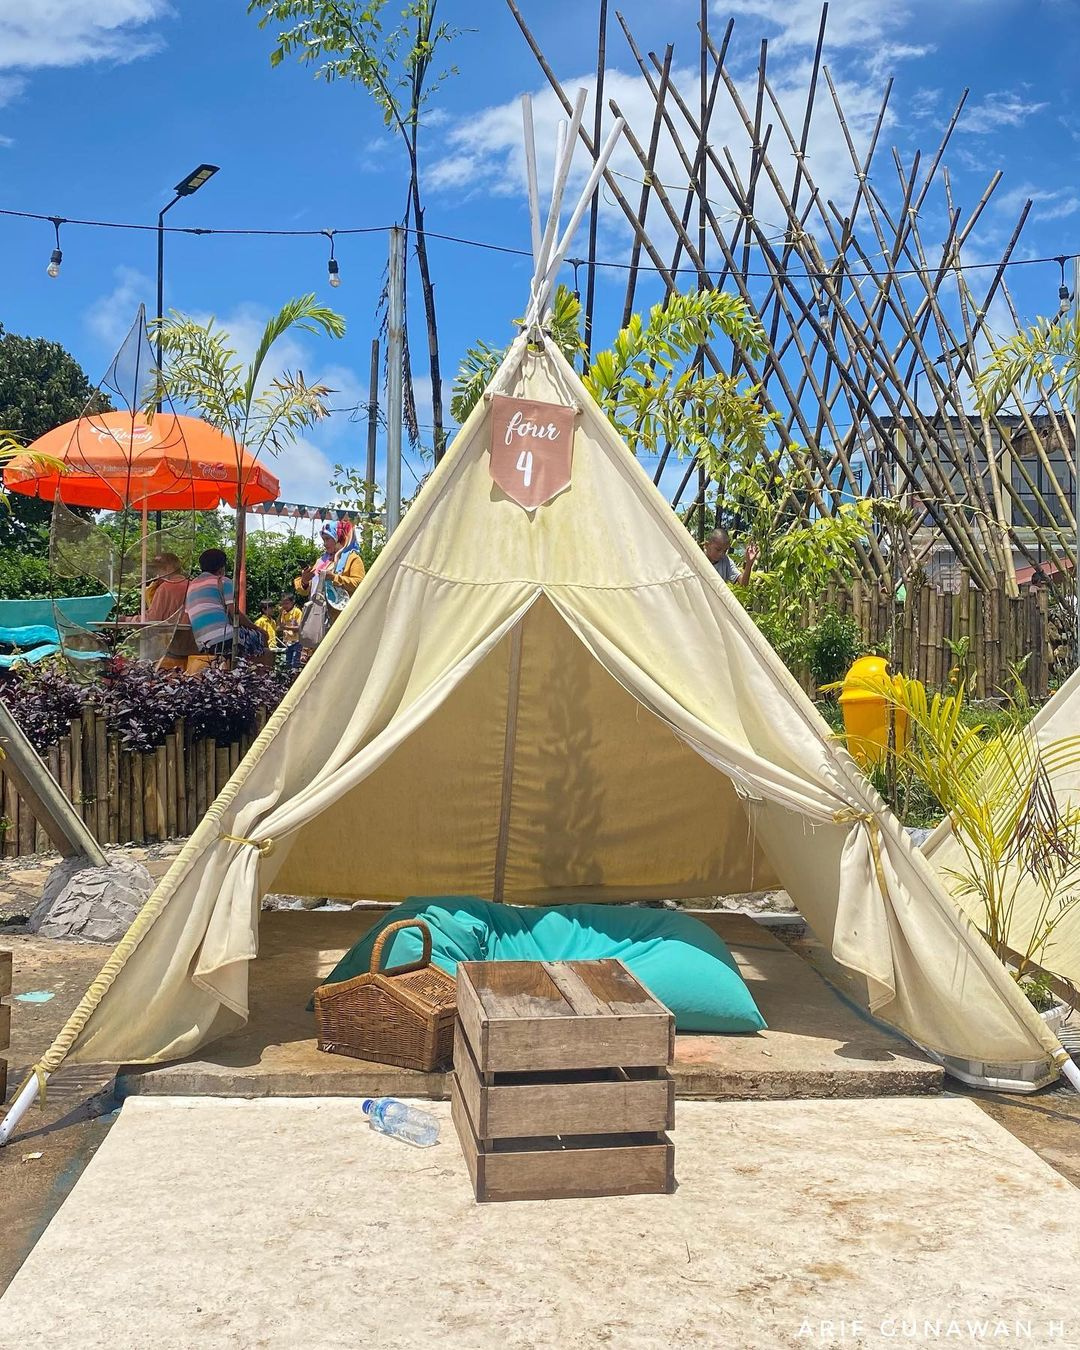 Tenda Indian Di The River Malino Image From @4rifgunawan